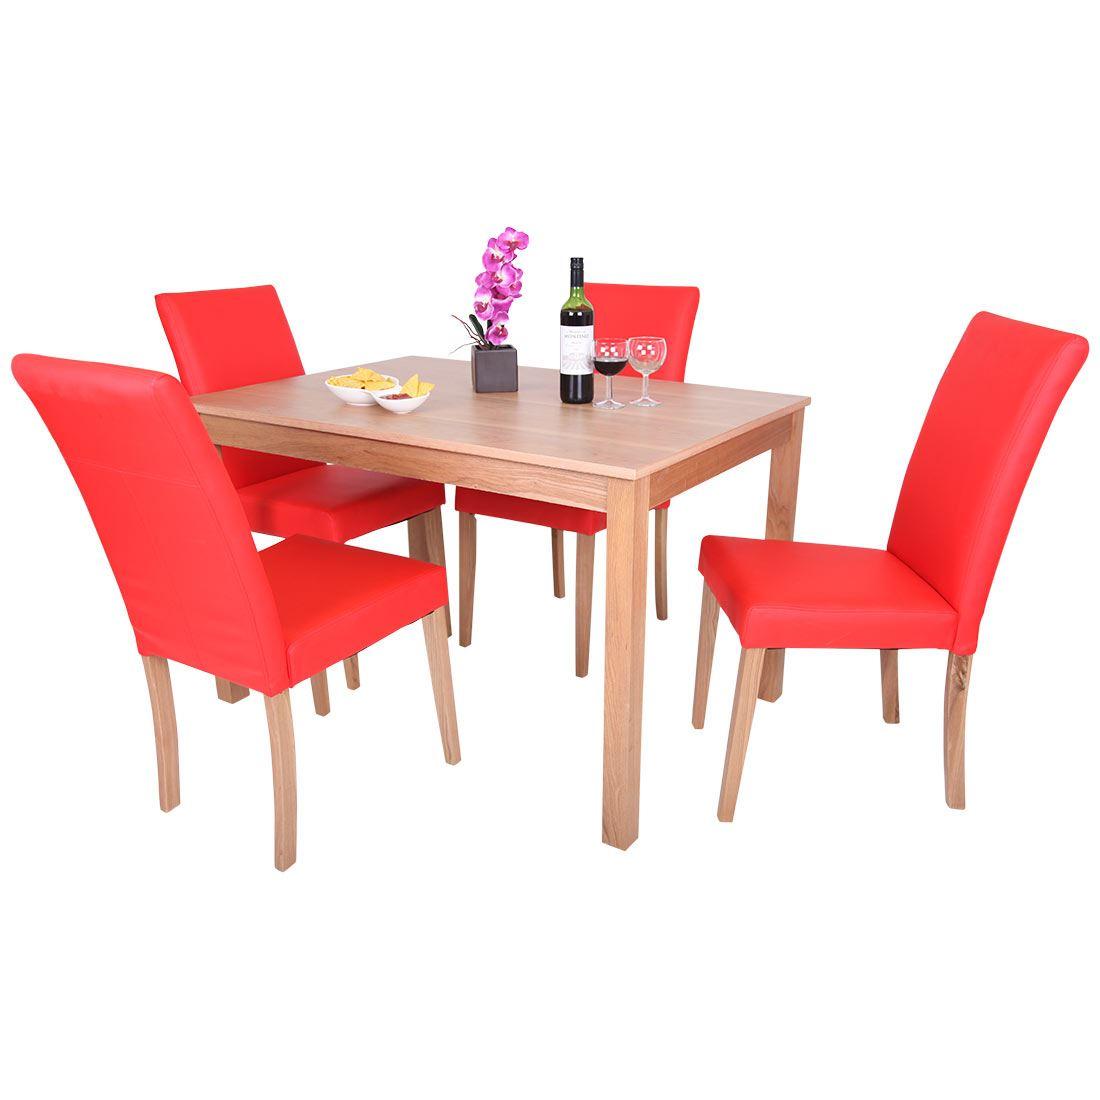 Dining Room Furniture Northern Ireland doorideacom : e8d685c1 3e12 40dd 86ca e734dd2b1a93 from dooridea.com size 1100 x 1100 jpeg 63kB